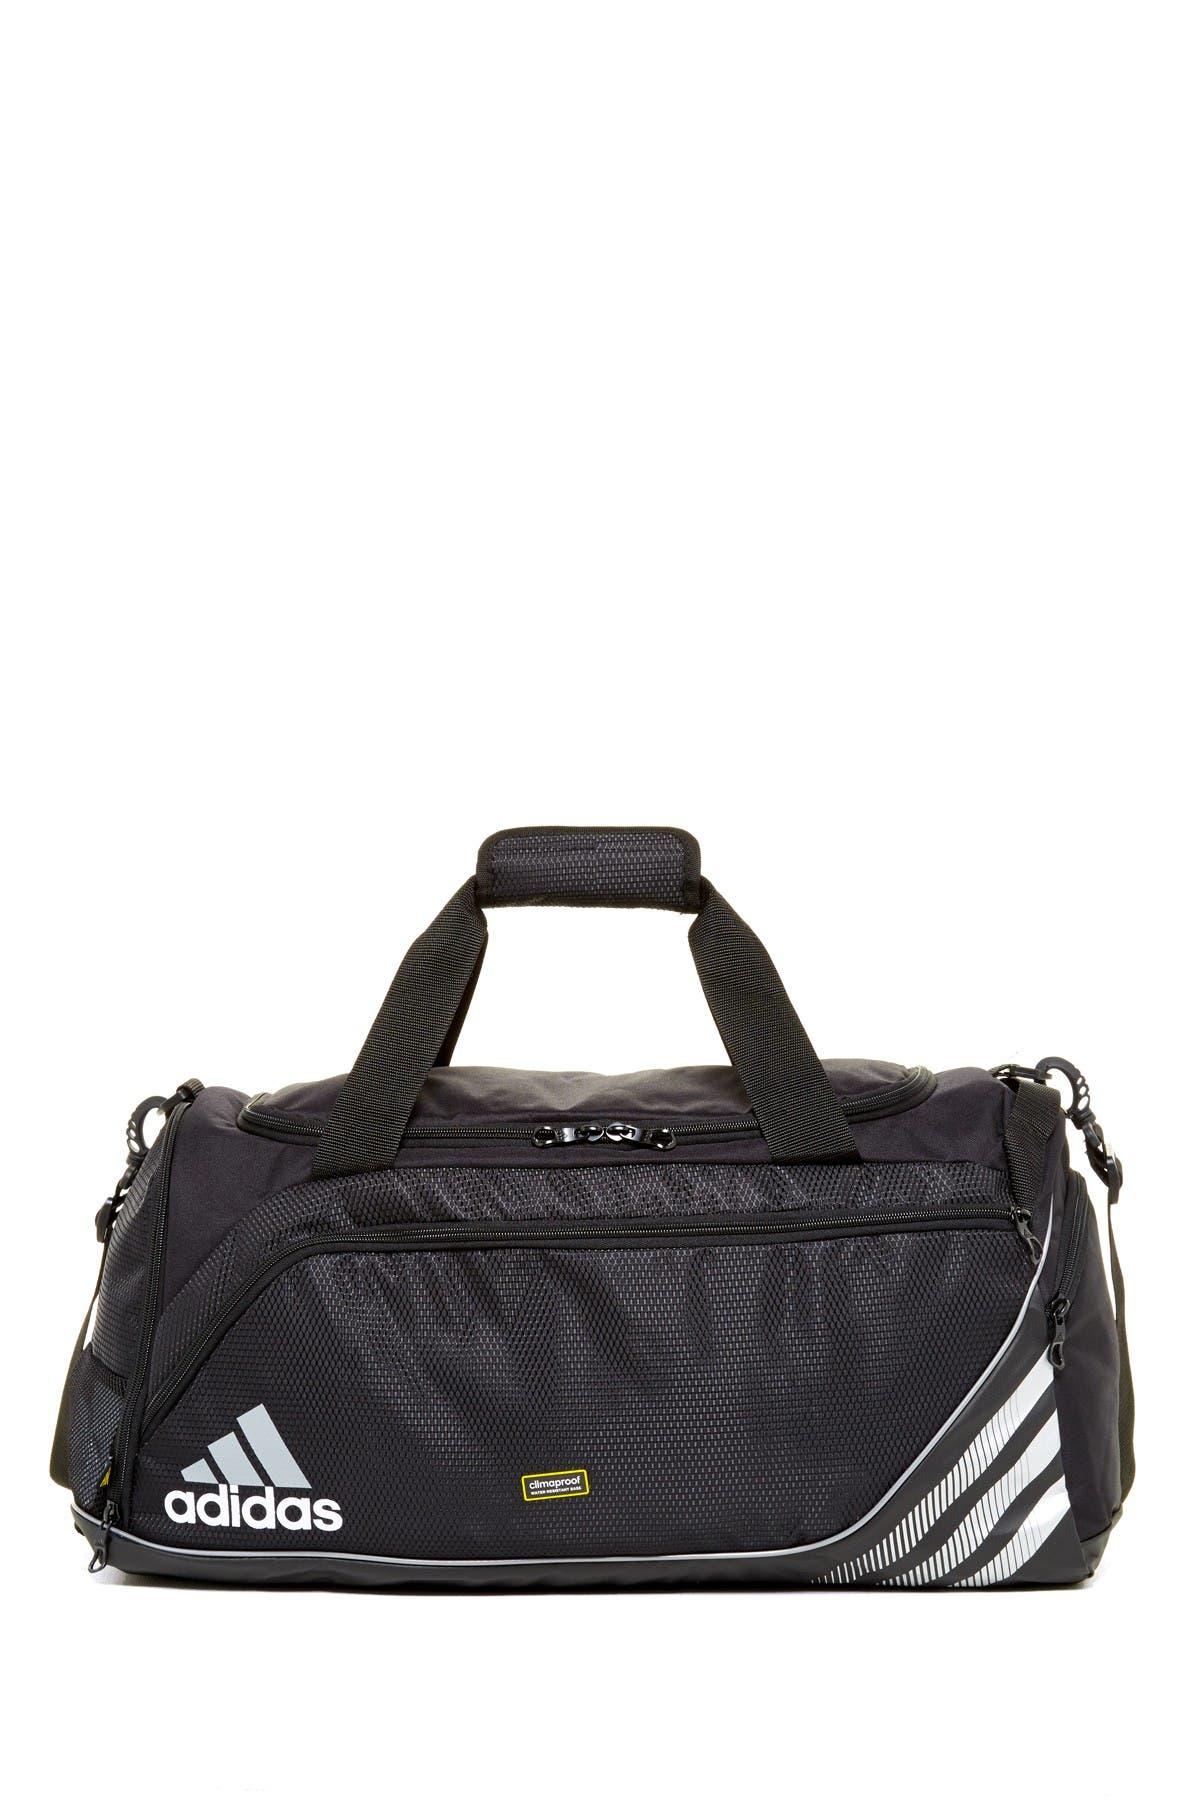 Image of adidas Team Speed Medium Duffle Bag